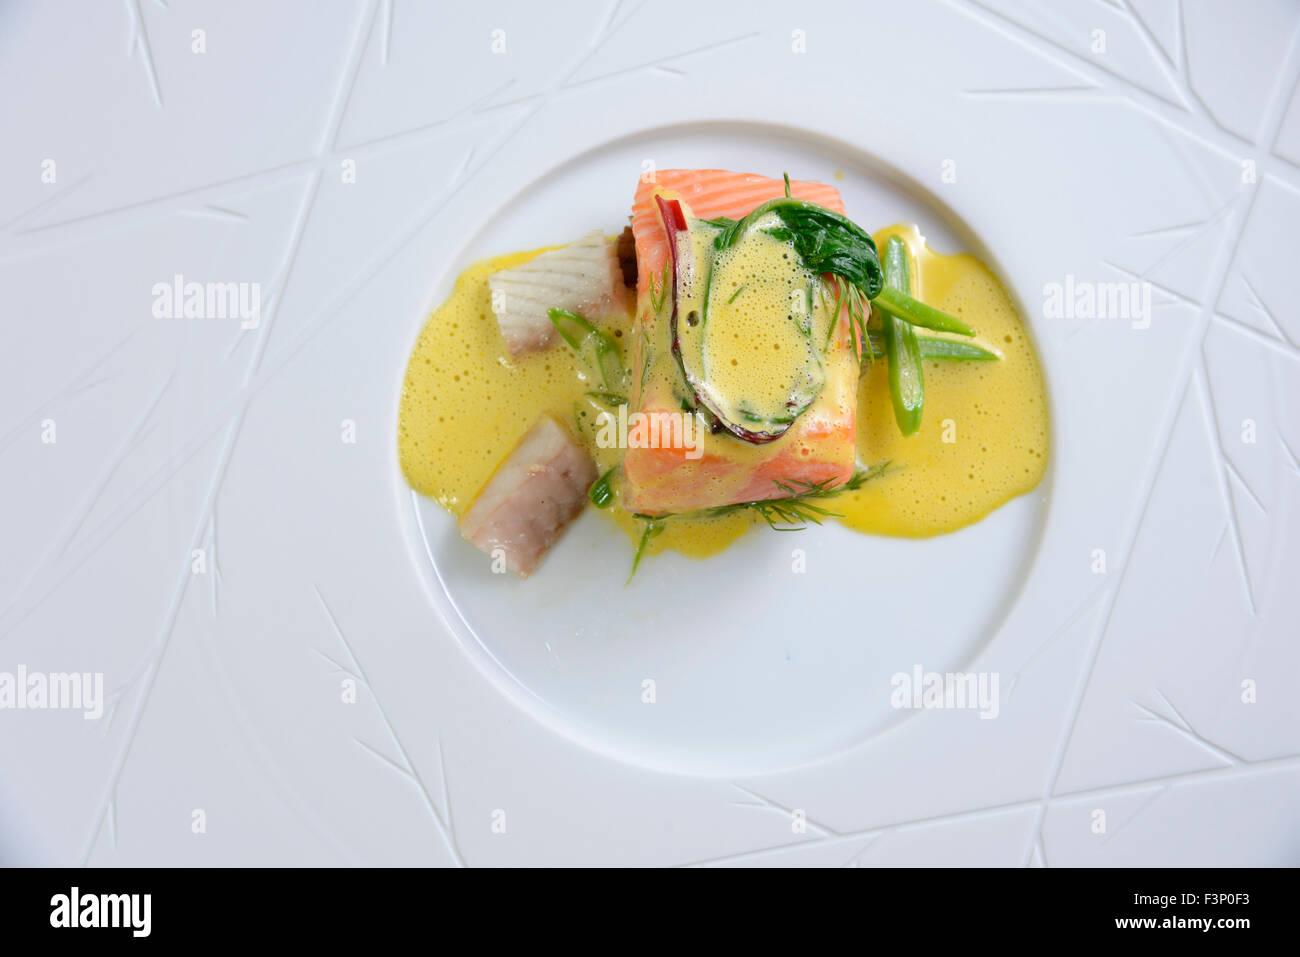 Nouvelle cuisine gourmet salmon fish dish Stock Photo